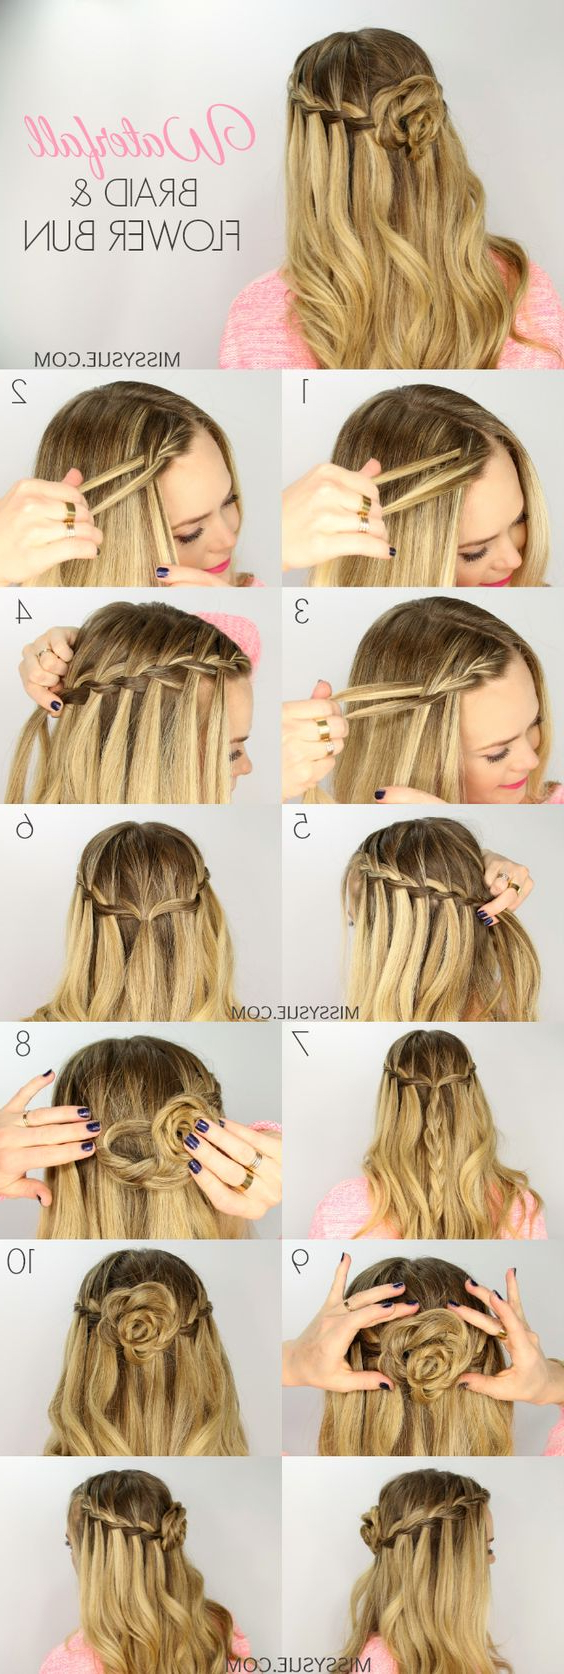 20 Waterfall Braid Tutorials Adding Beautiful Twists And Regarding Newest Waterfall Mermaid Braid Hairstyles (View 2 of 20)